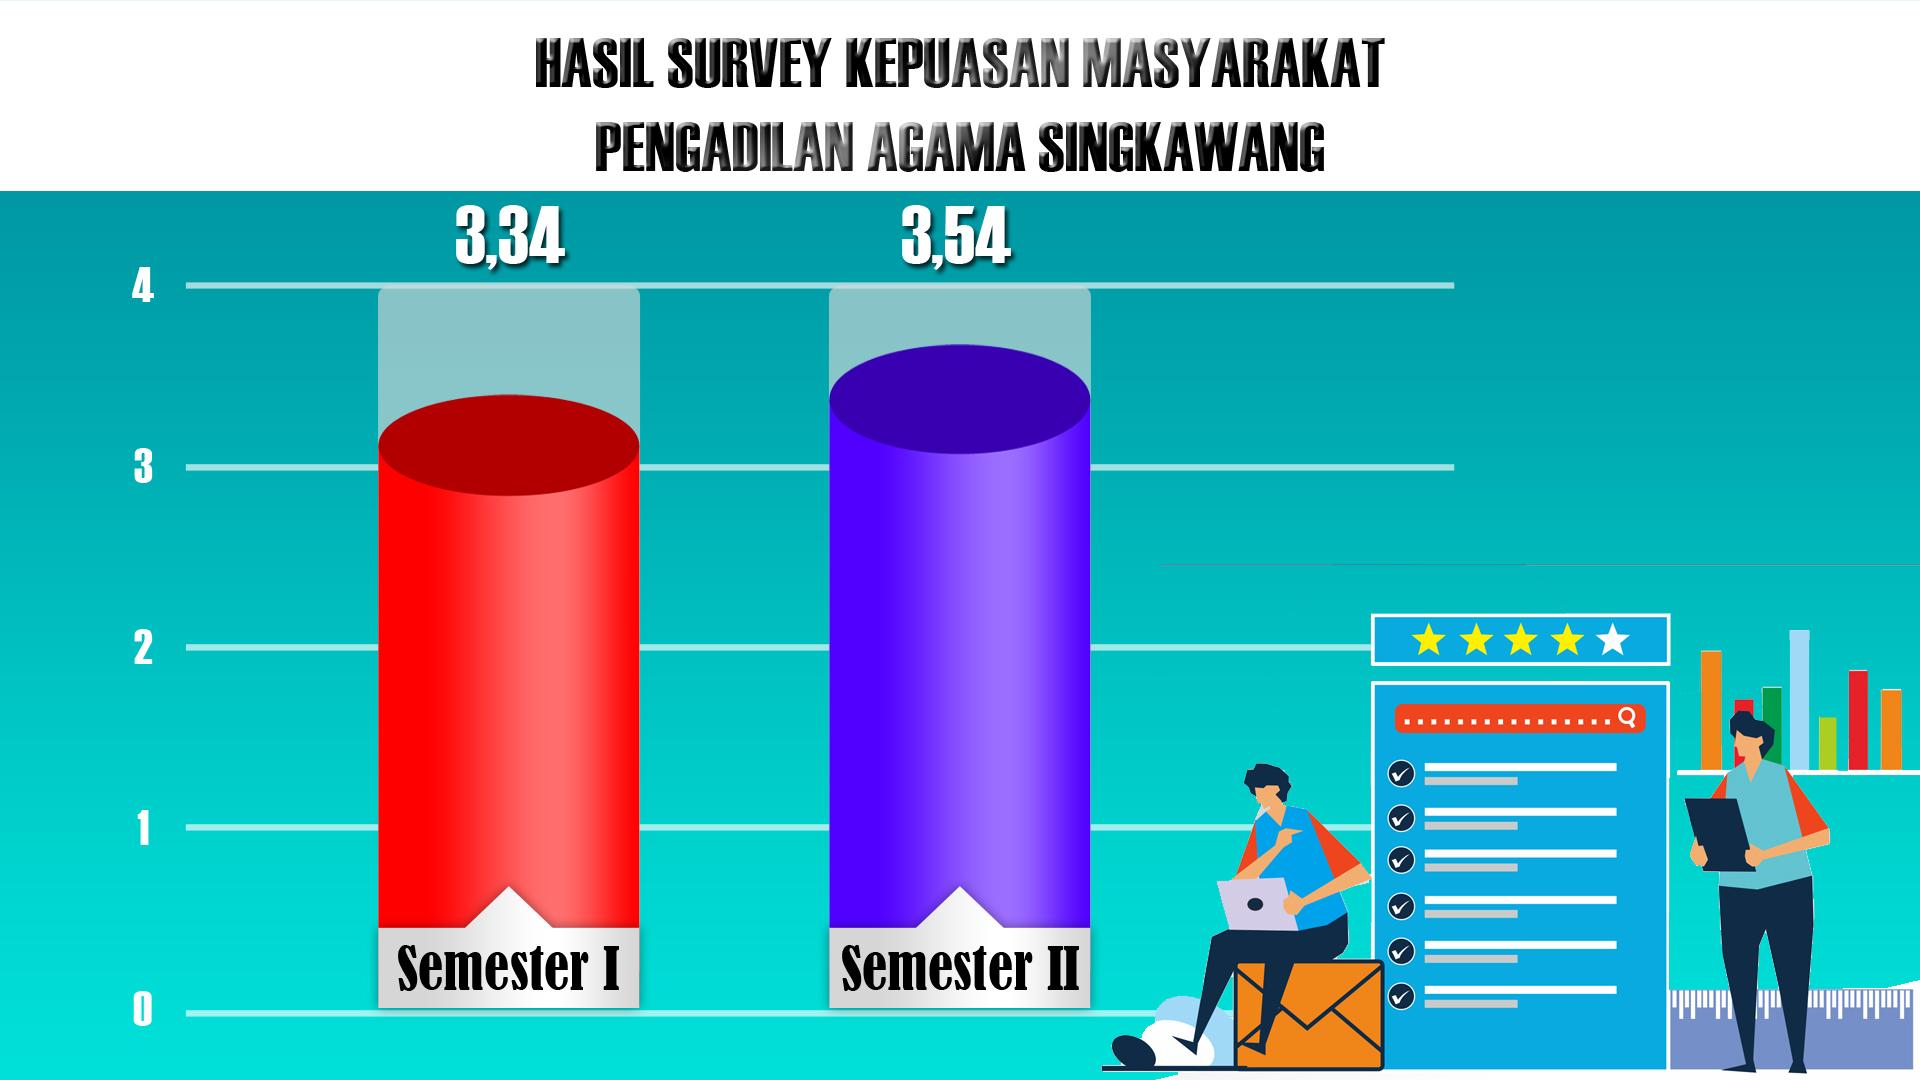 HASIL SURVEY KEPUASAN MASYARAKAT MASYARAKAT